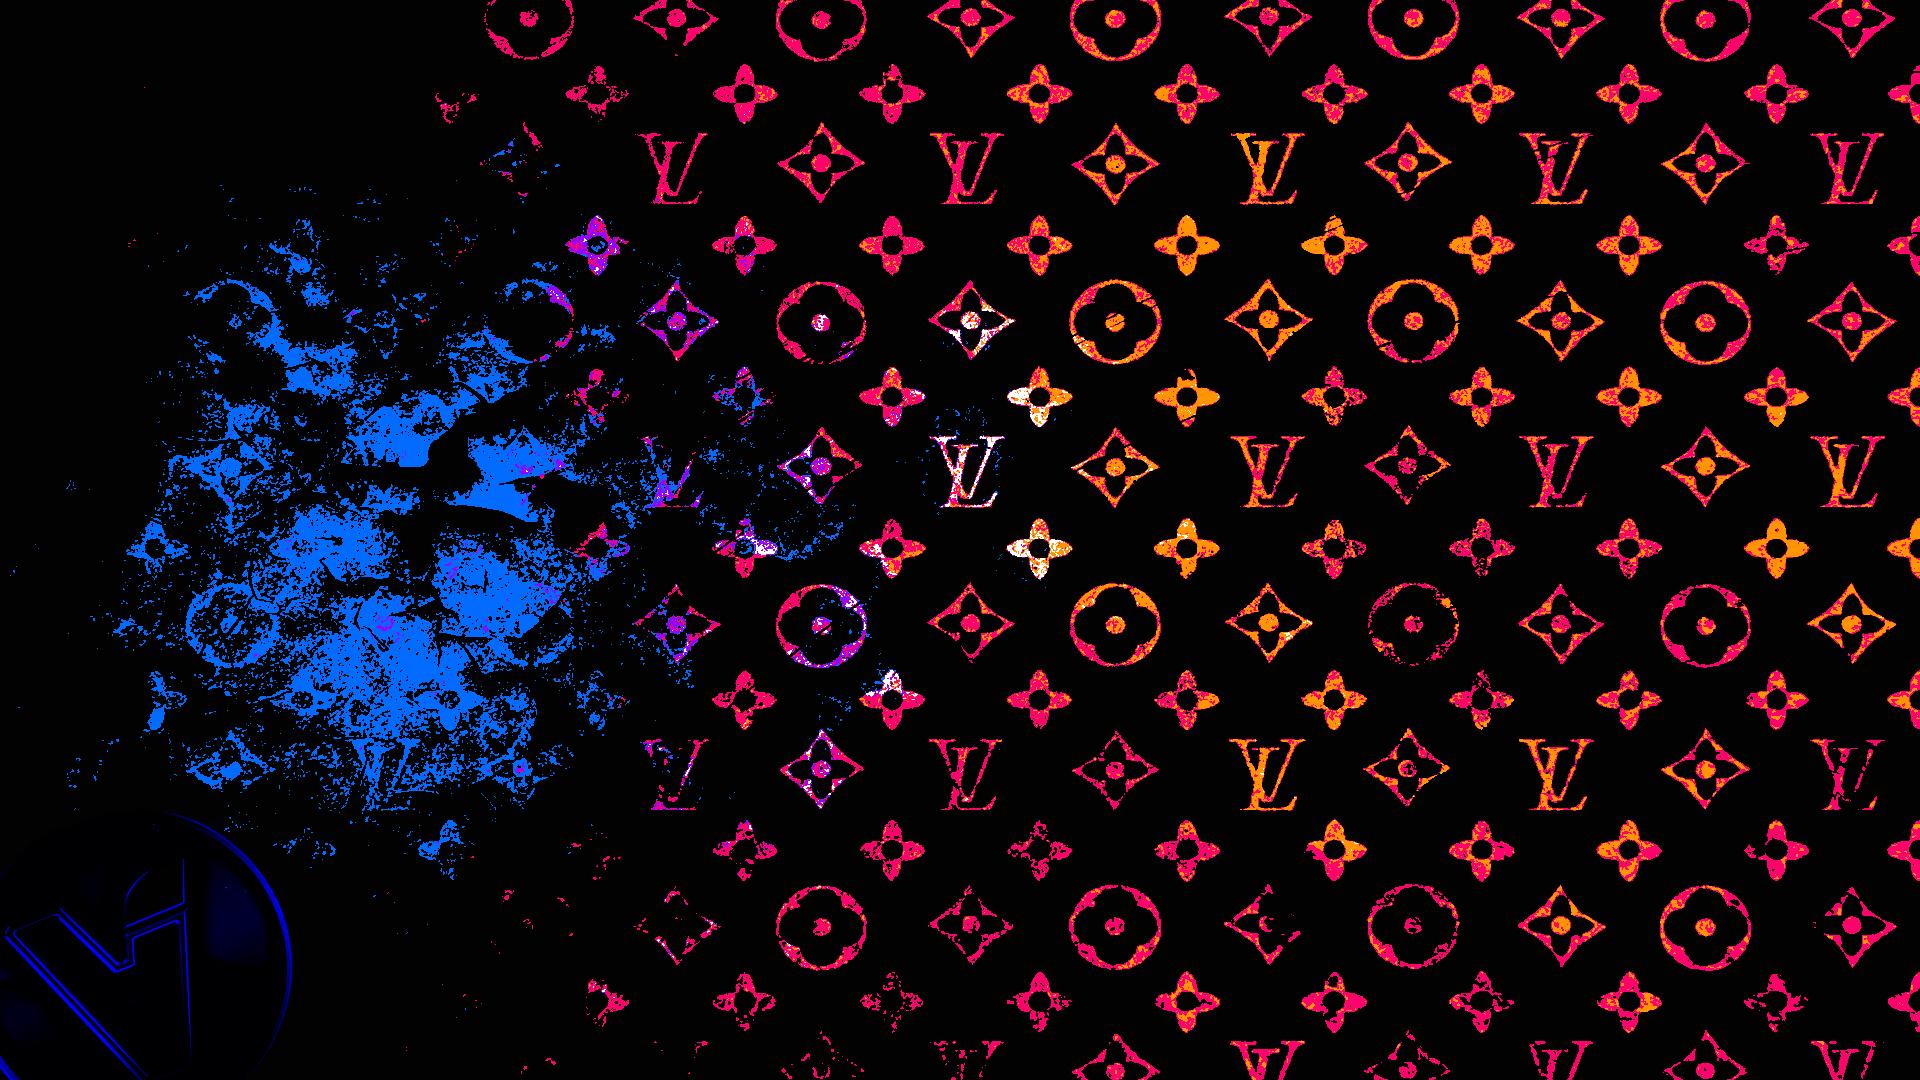 Louis Vuitton Wallpaper By Vekyr1 On Deviantart